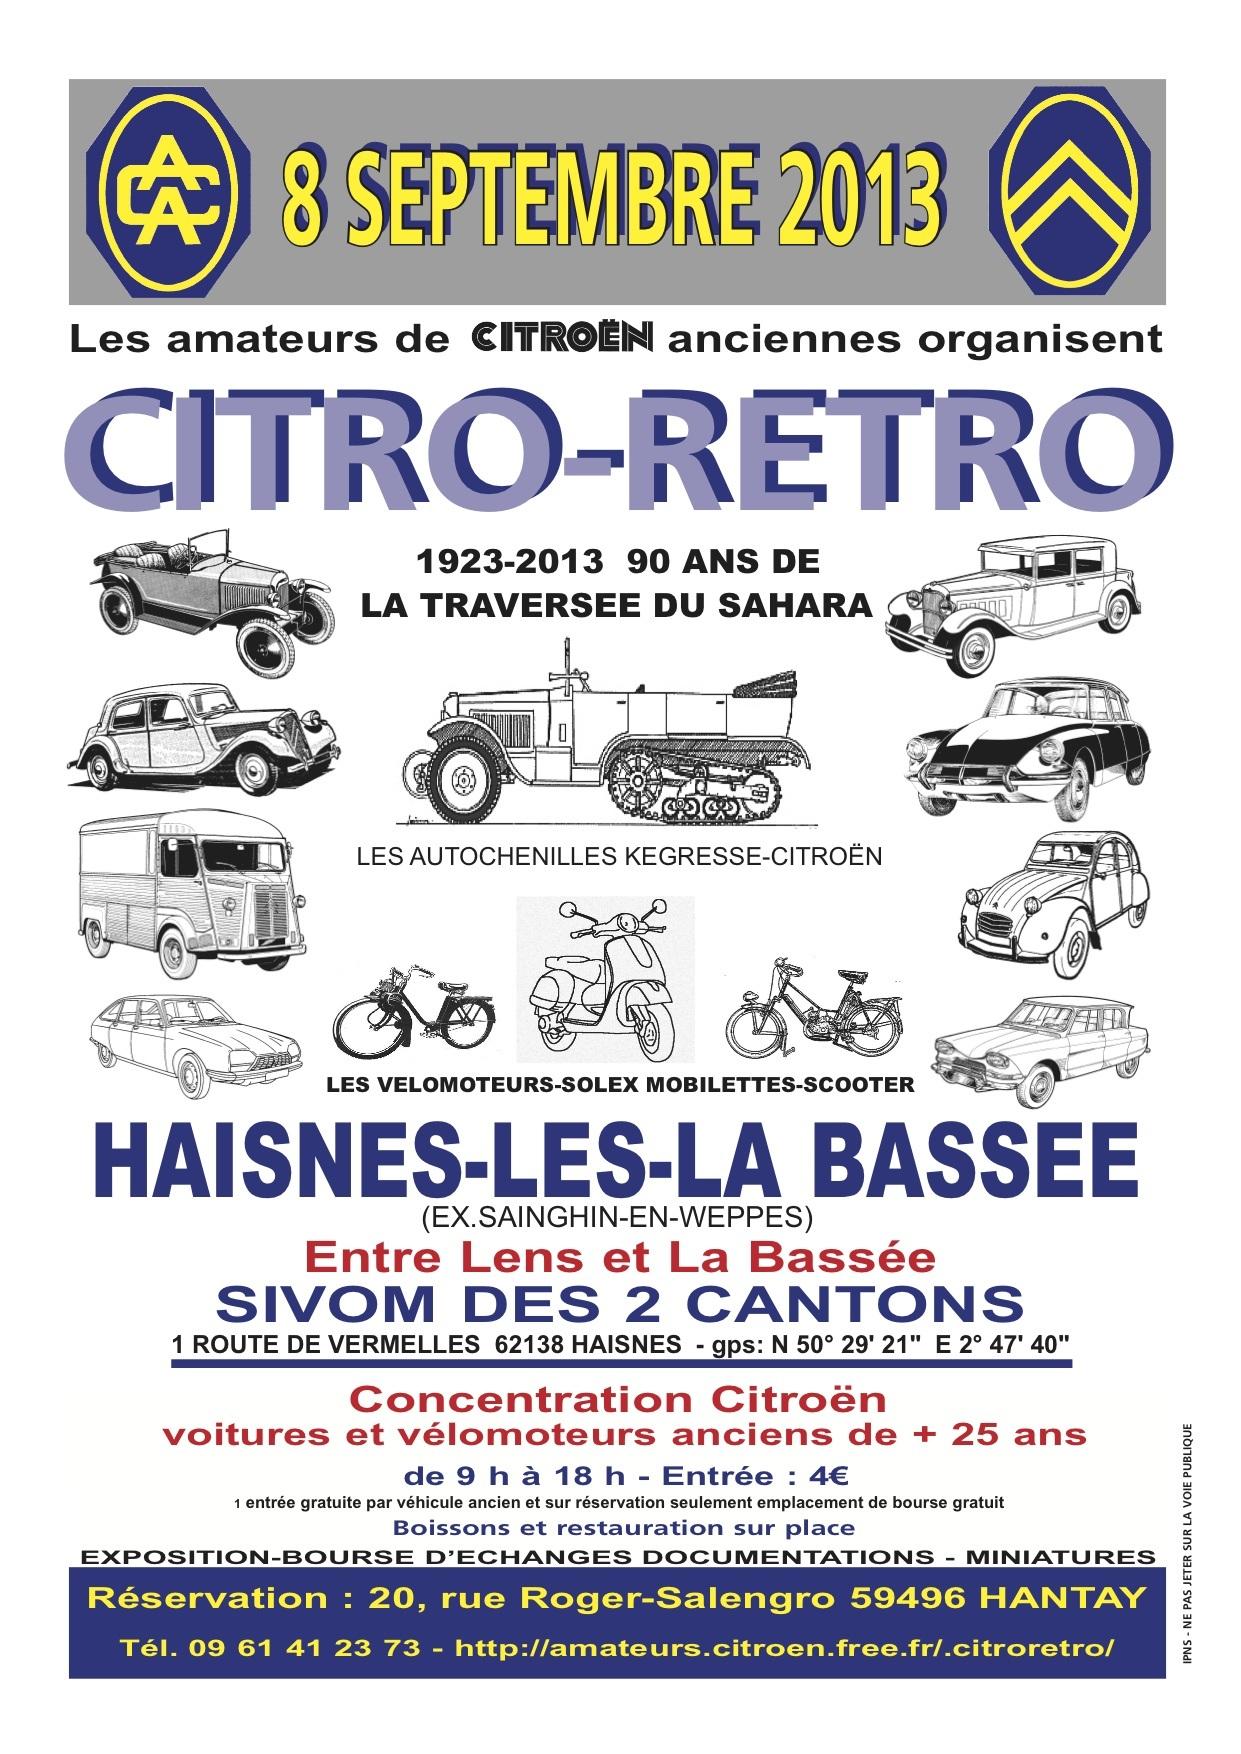 Citro-Retro-2013-affiche